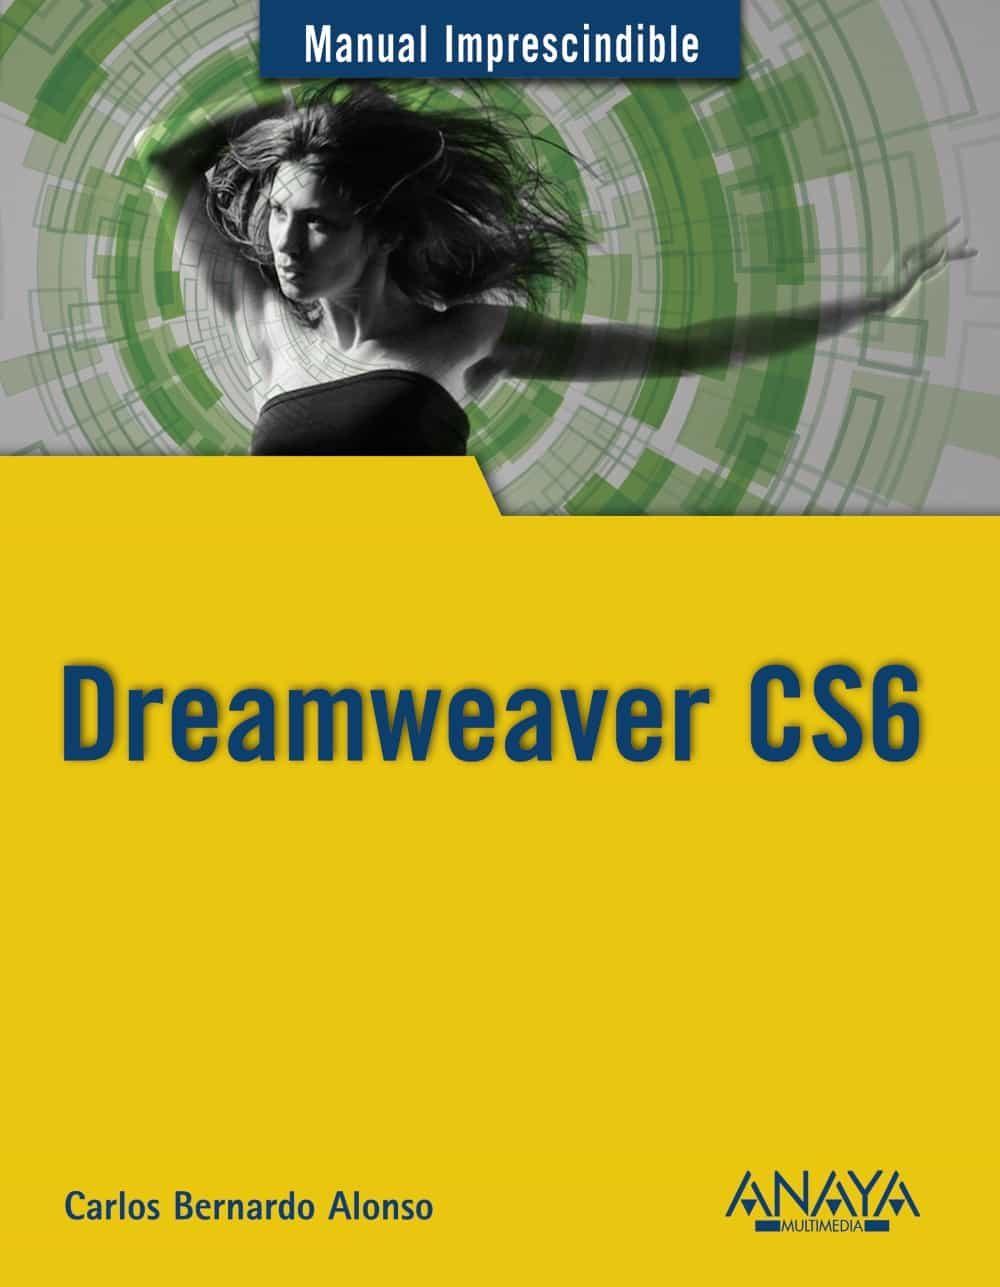 Dreamweaver cs6: the missing manual ebook by david sawyer.